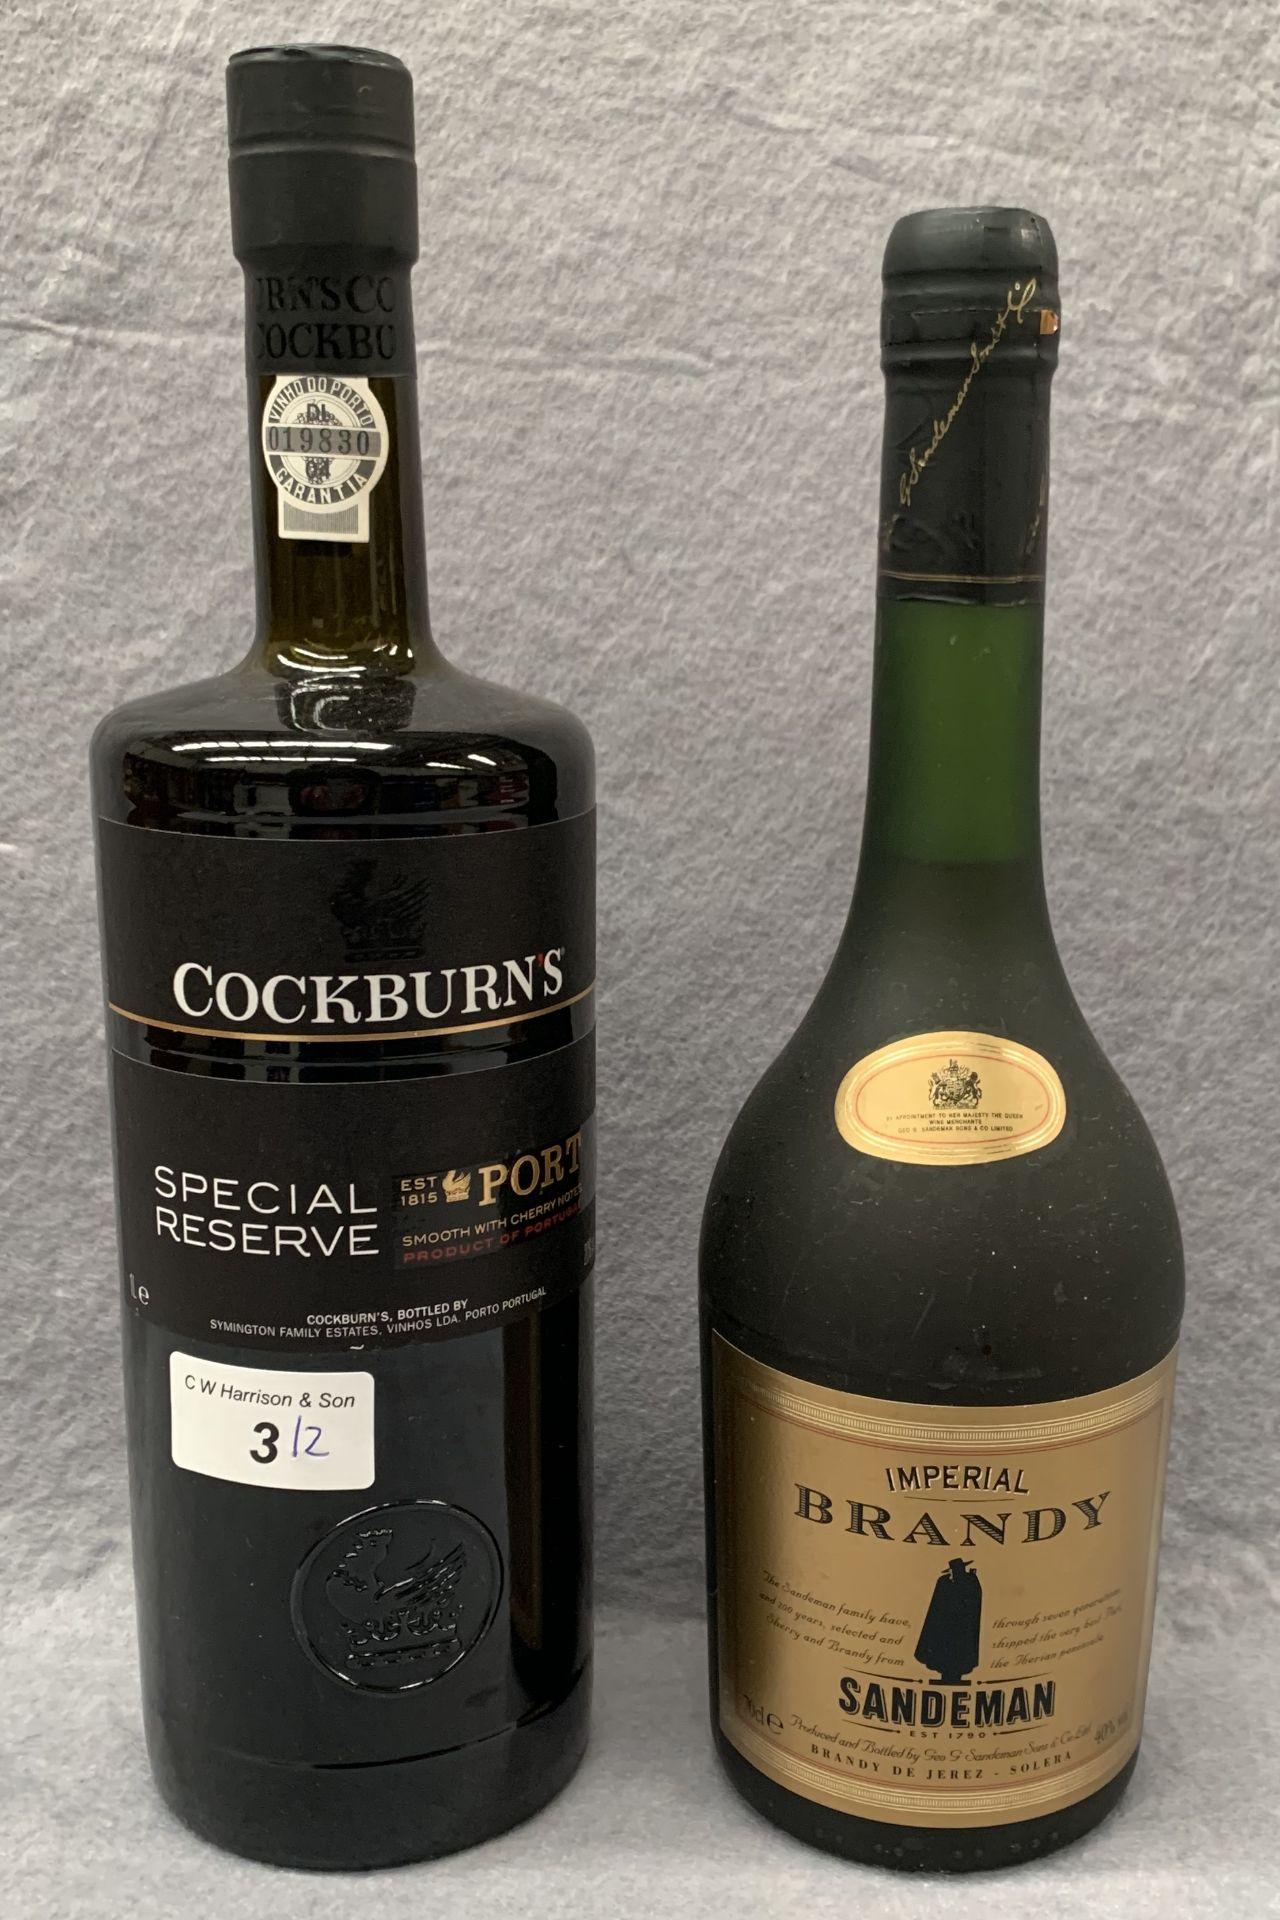 Lot 3 - A 1 litre bottle of Cockburns Special Reserve Port and a 70cl bottle of Sandeman Imperial Brandy